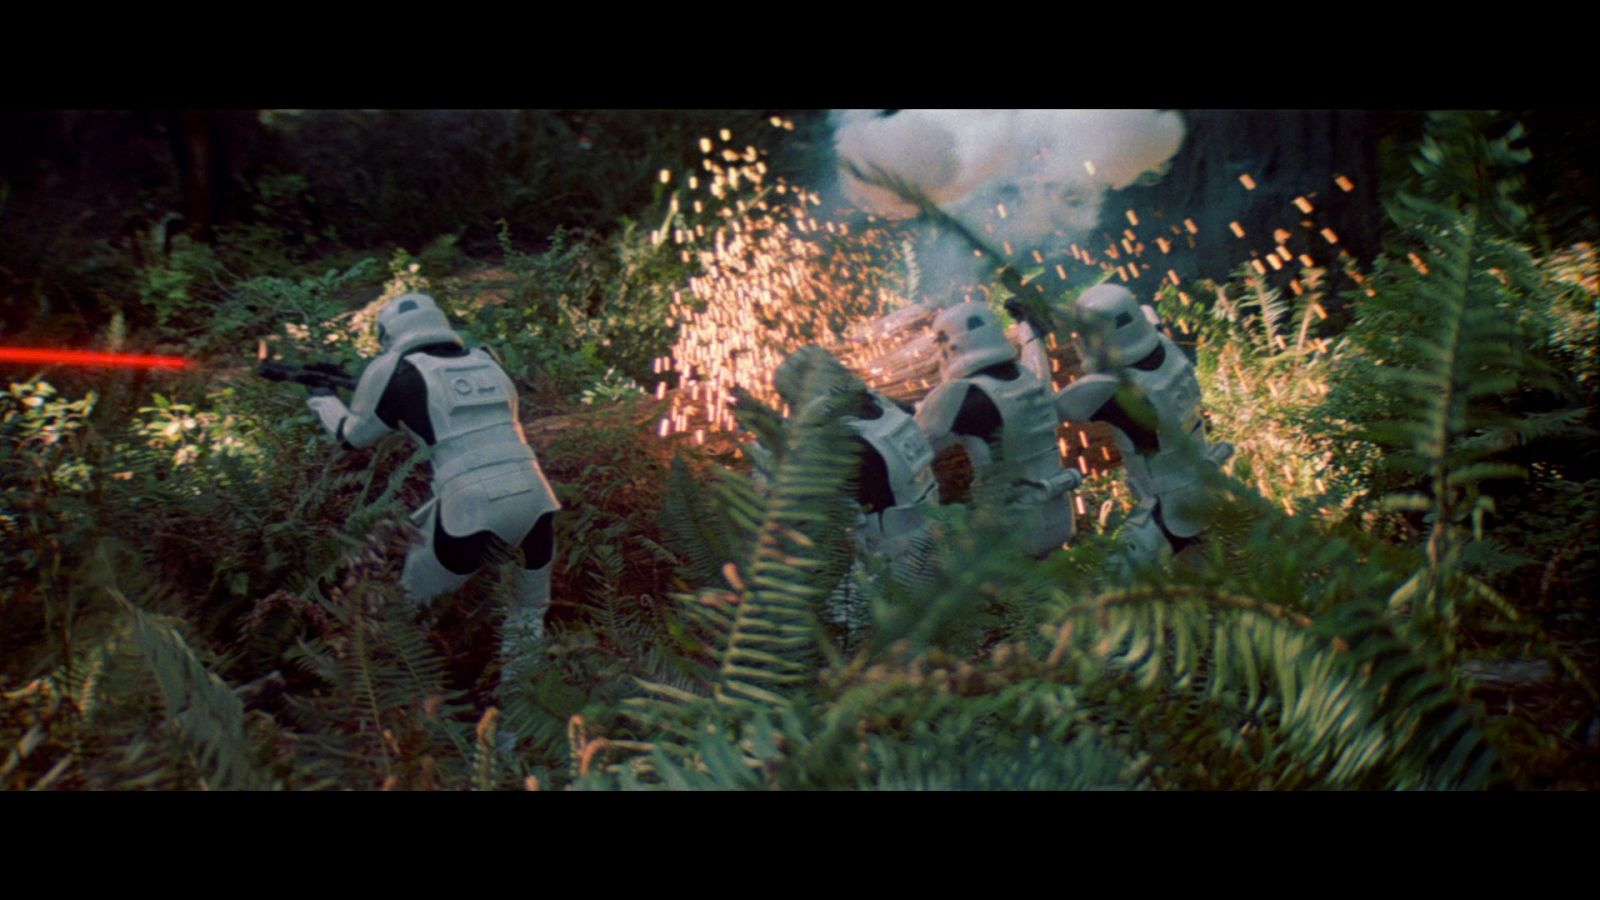 Star Wars Return of the Jedi Bluray Capture-77.jpg